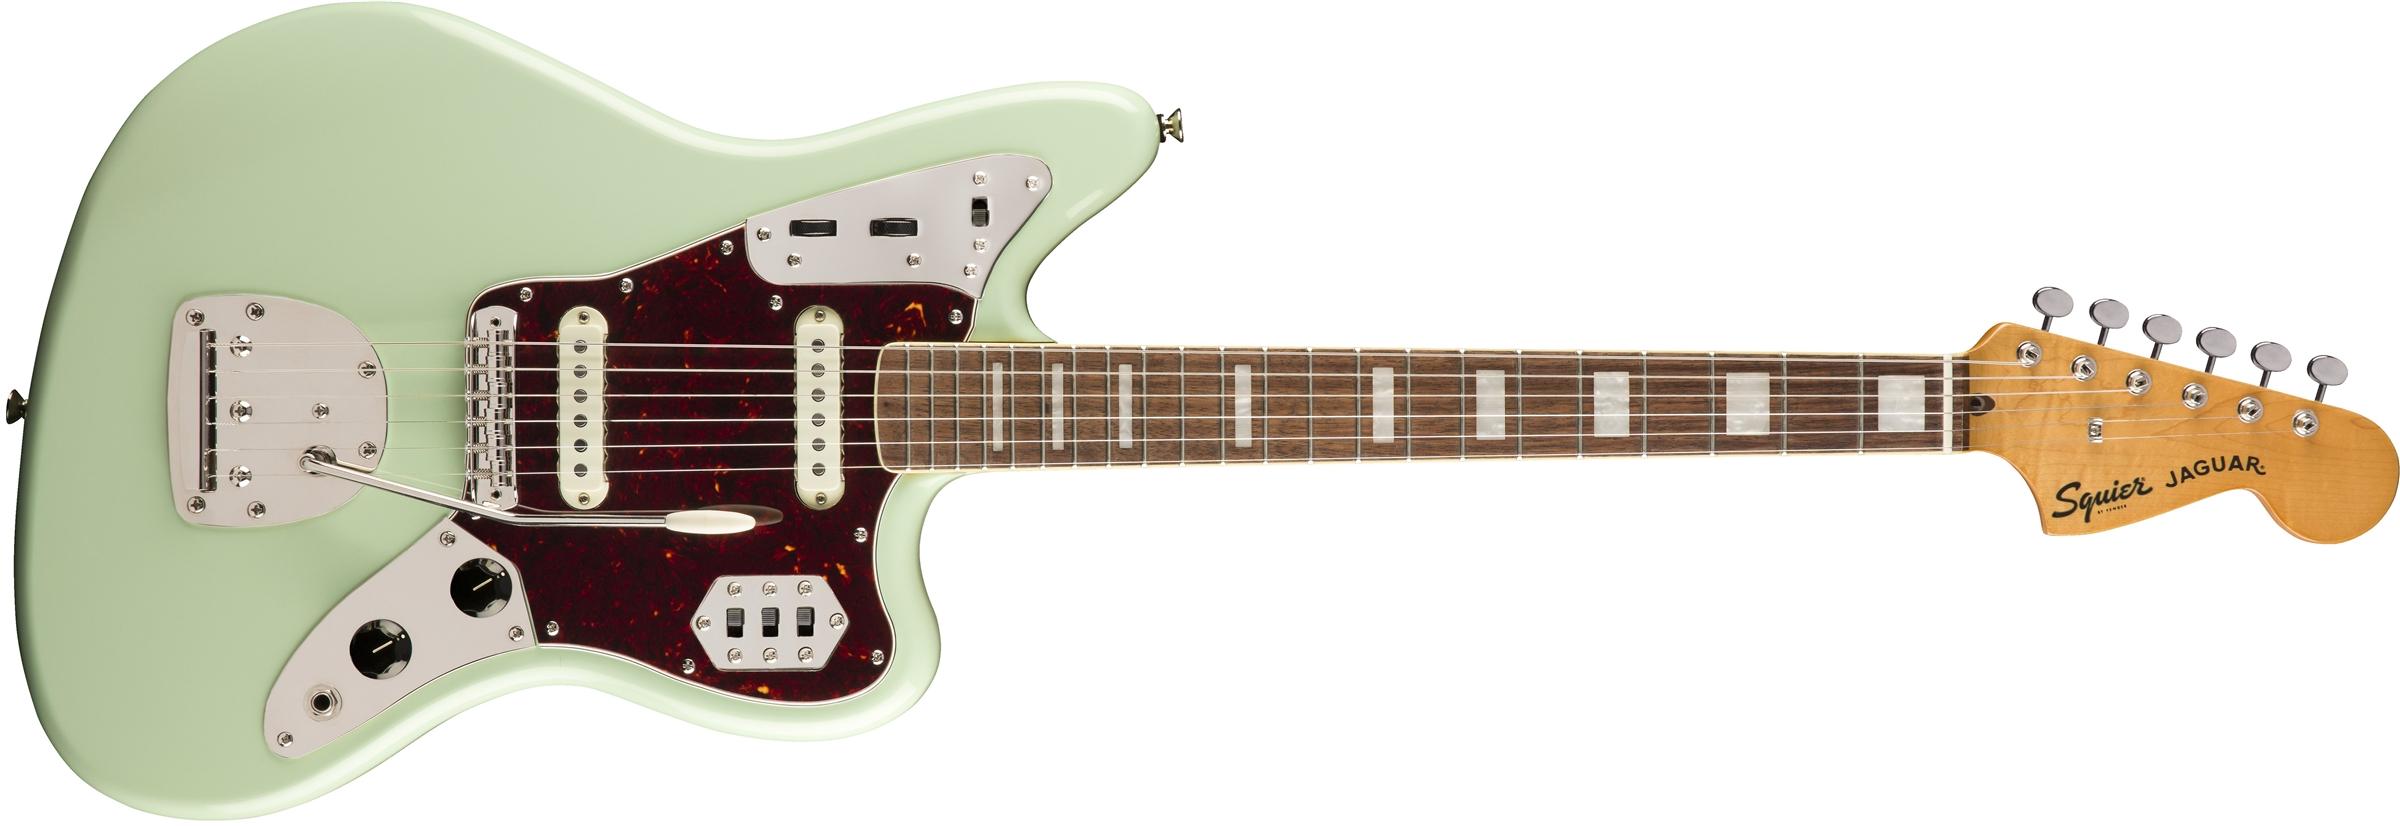 SQUIER-Classic-Vibe-70s-Jaguar-LF-Surf-Green-0374090557-sku-22958